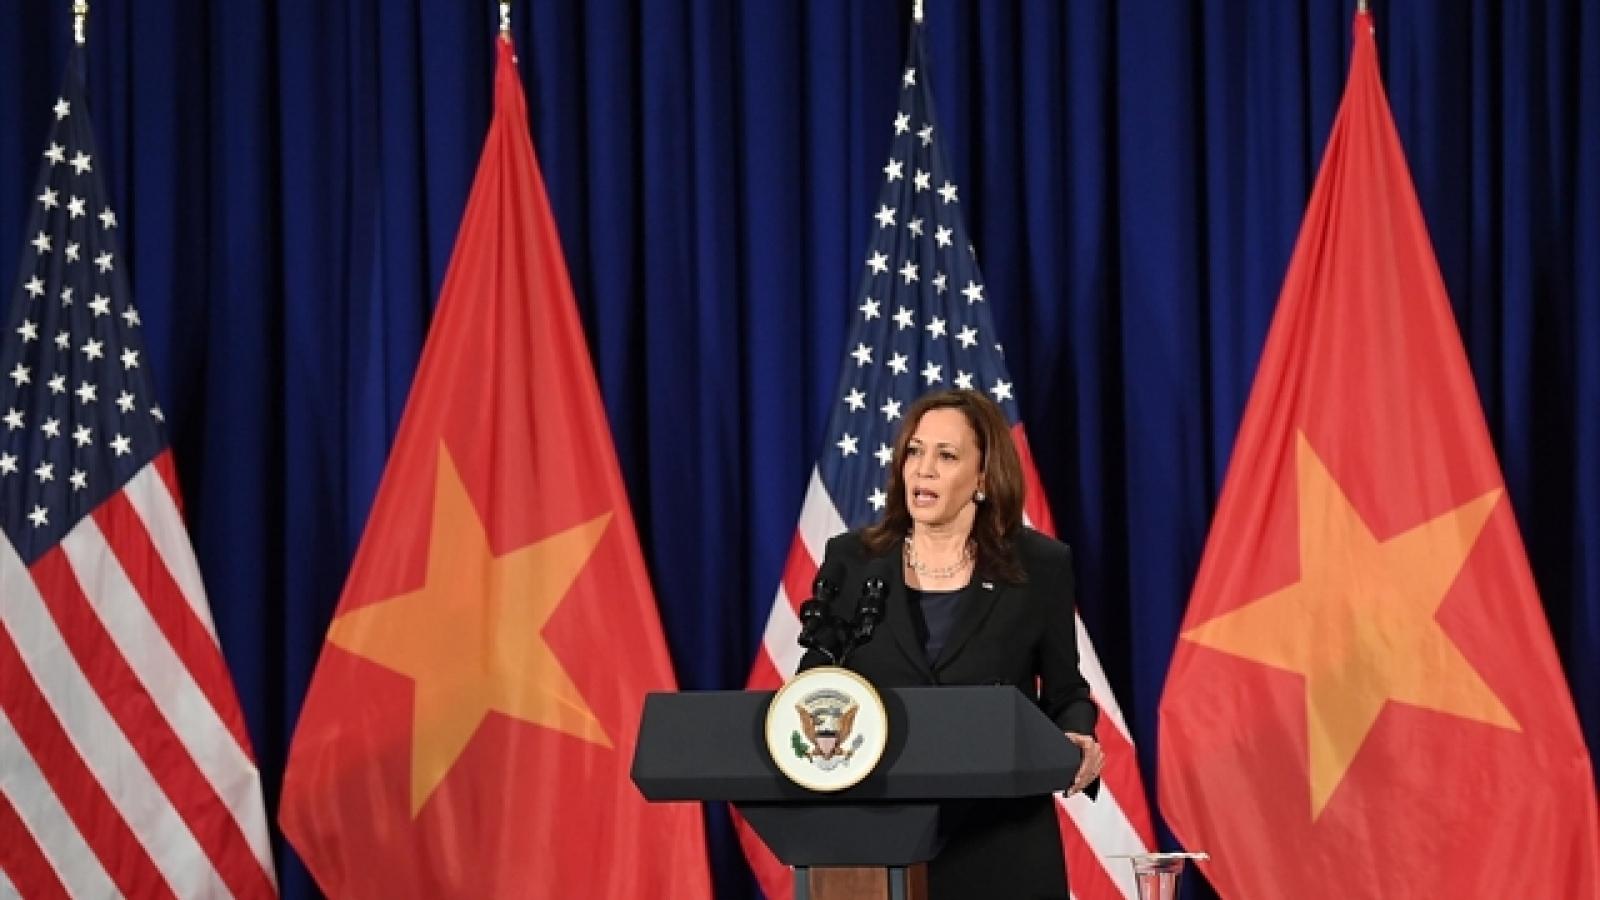 Visit signals new beginning in US-Vietnam relations, says VP Harris